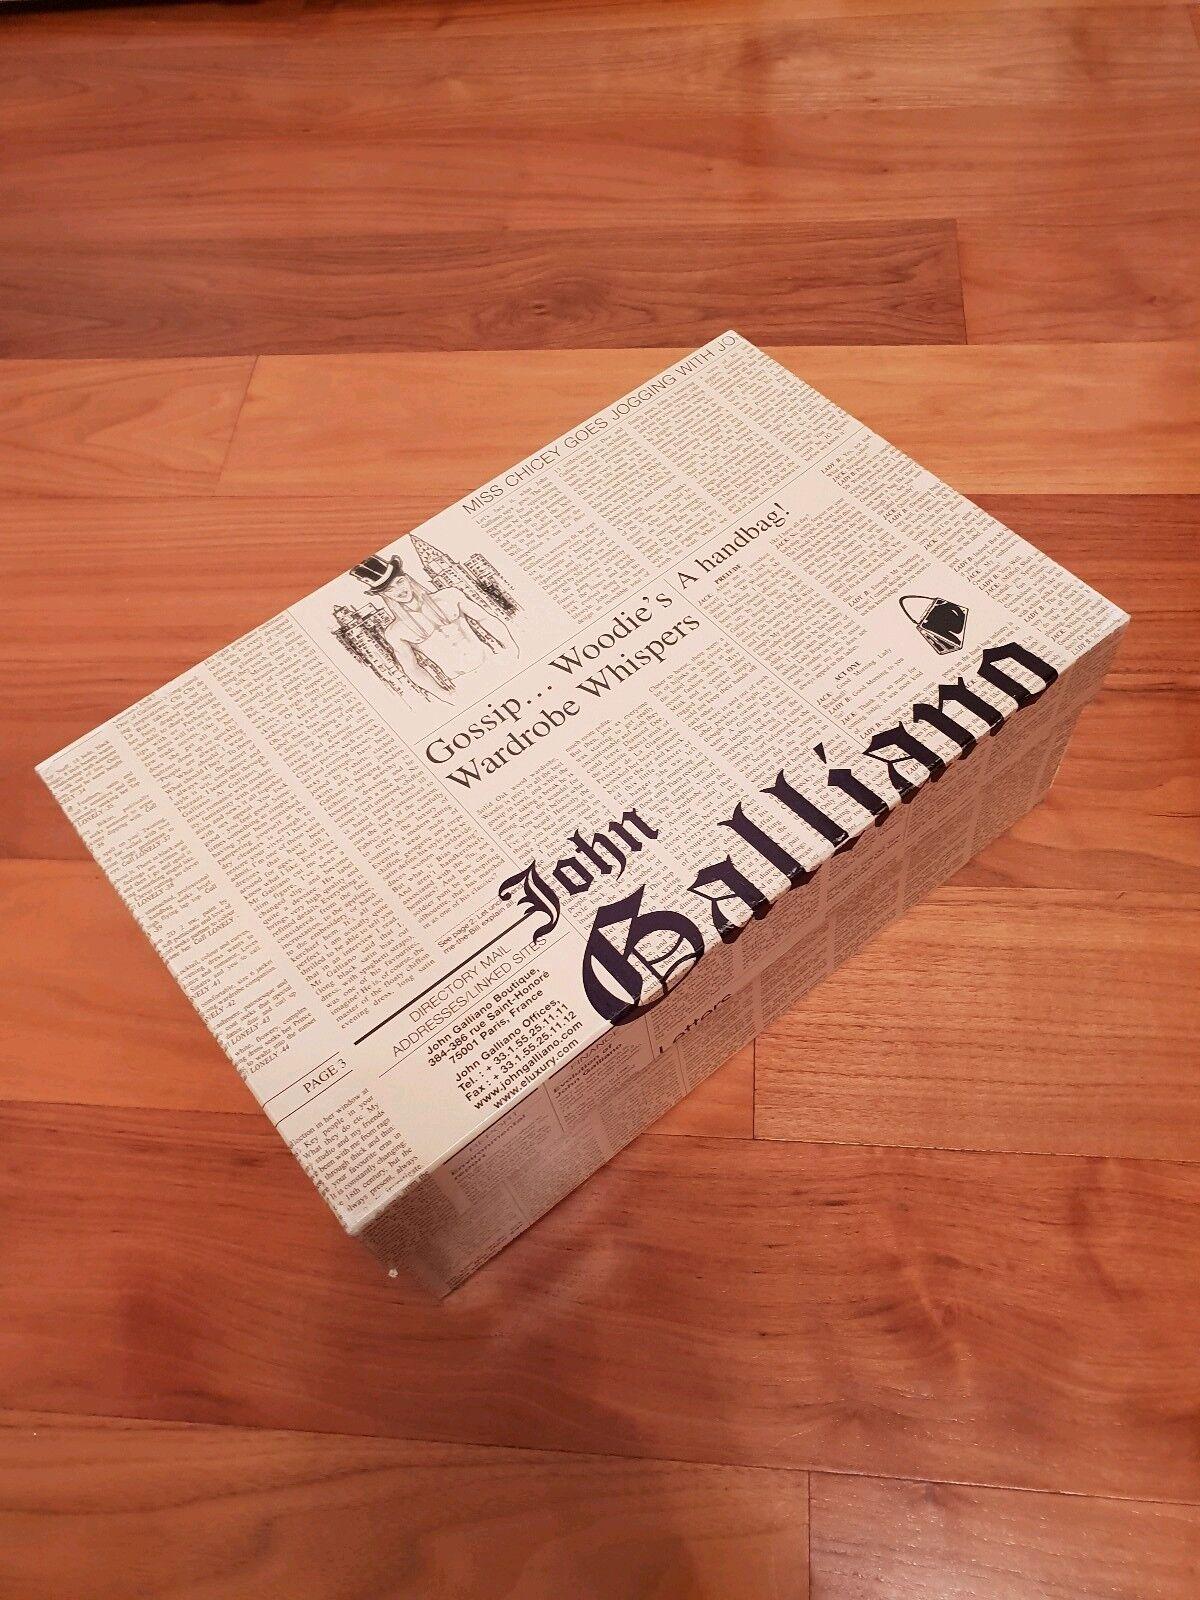 John GALLIANO leggermente usati usati usati Vintage Scarpe Da Ginnastica 96754a